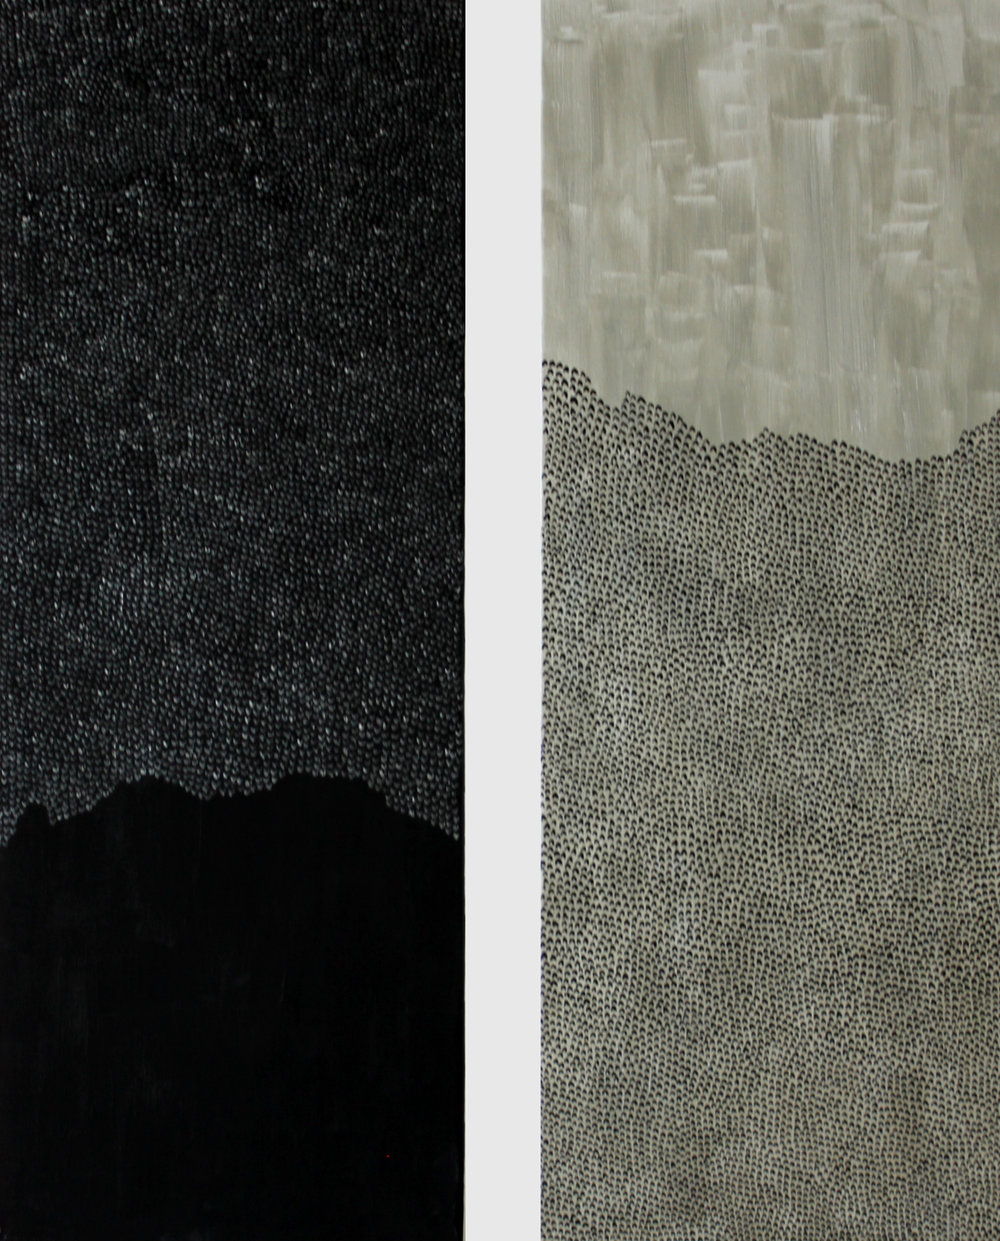 Yin_and_Yang.jpg